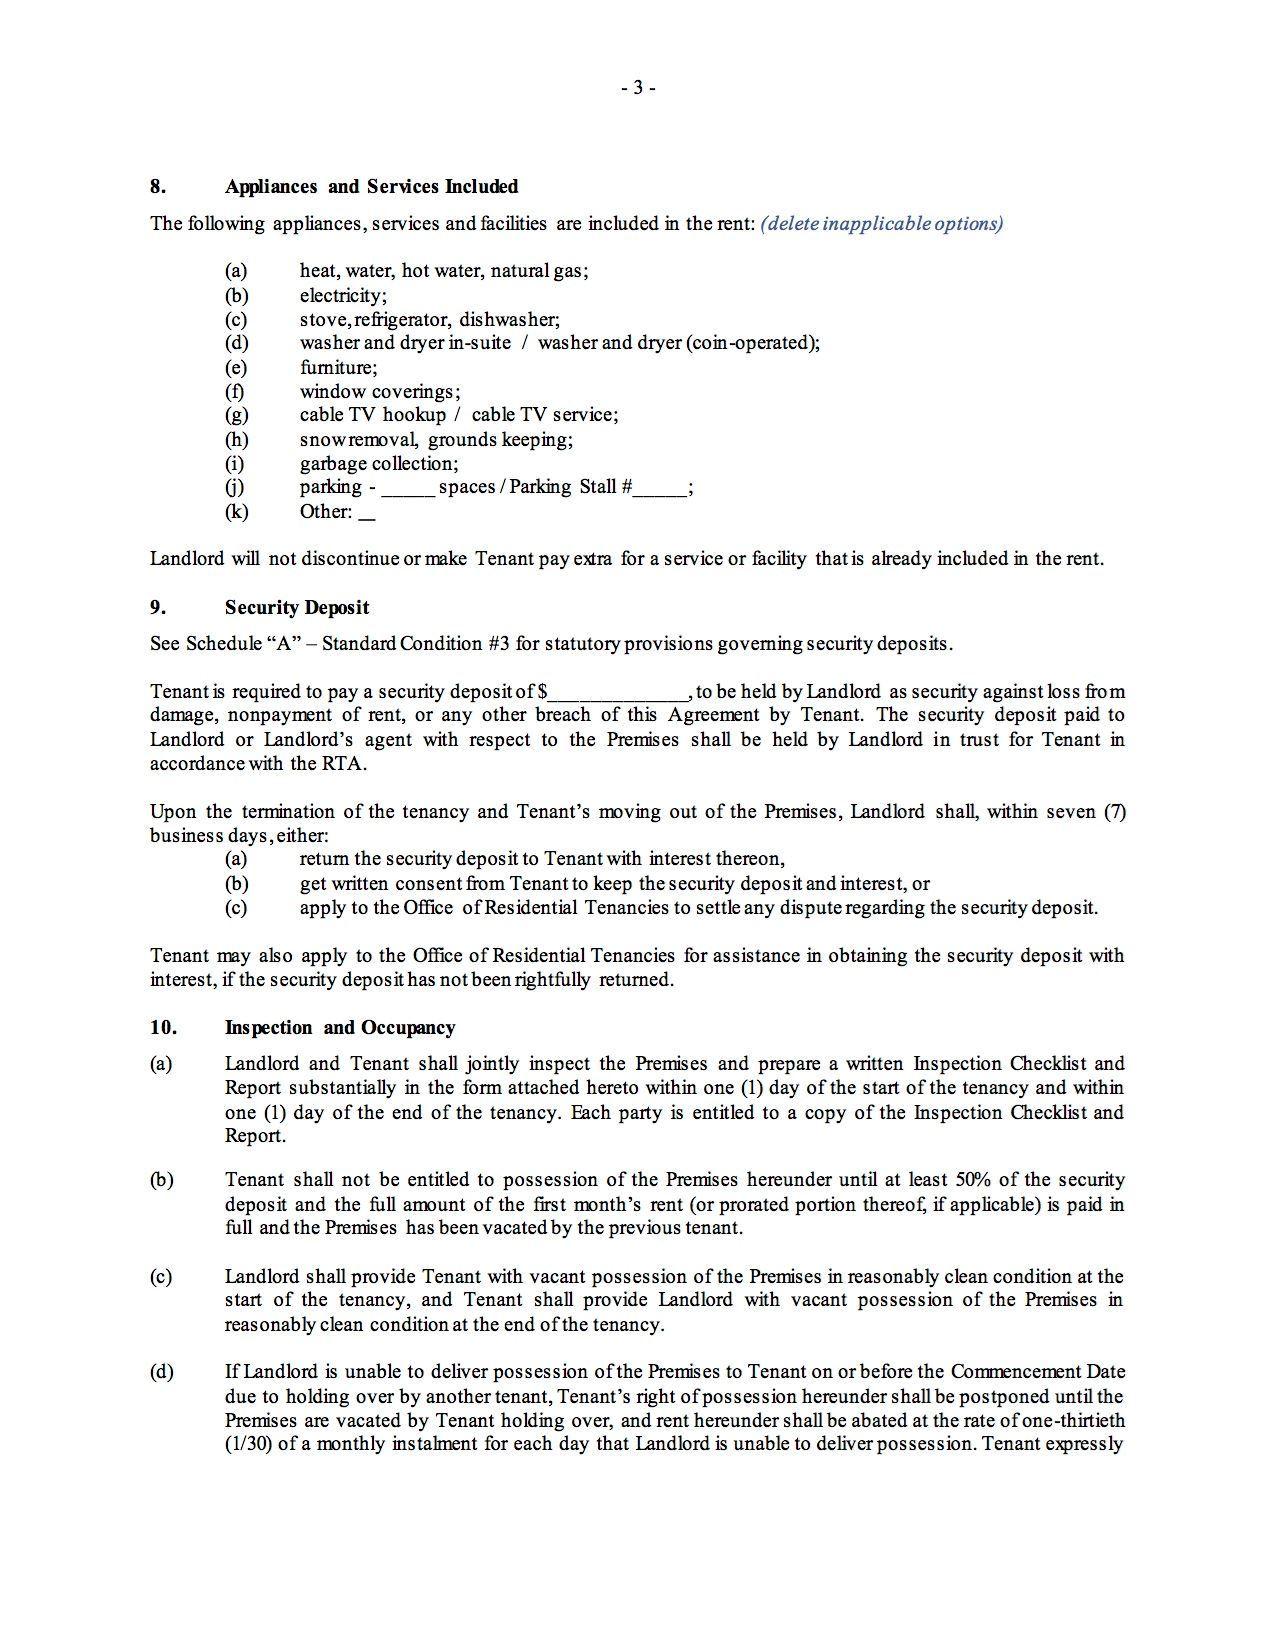 Saskatchewan Residential Fixed Term Lease Or Tenancy